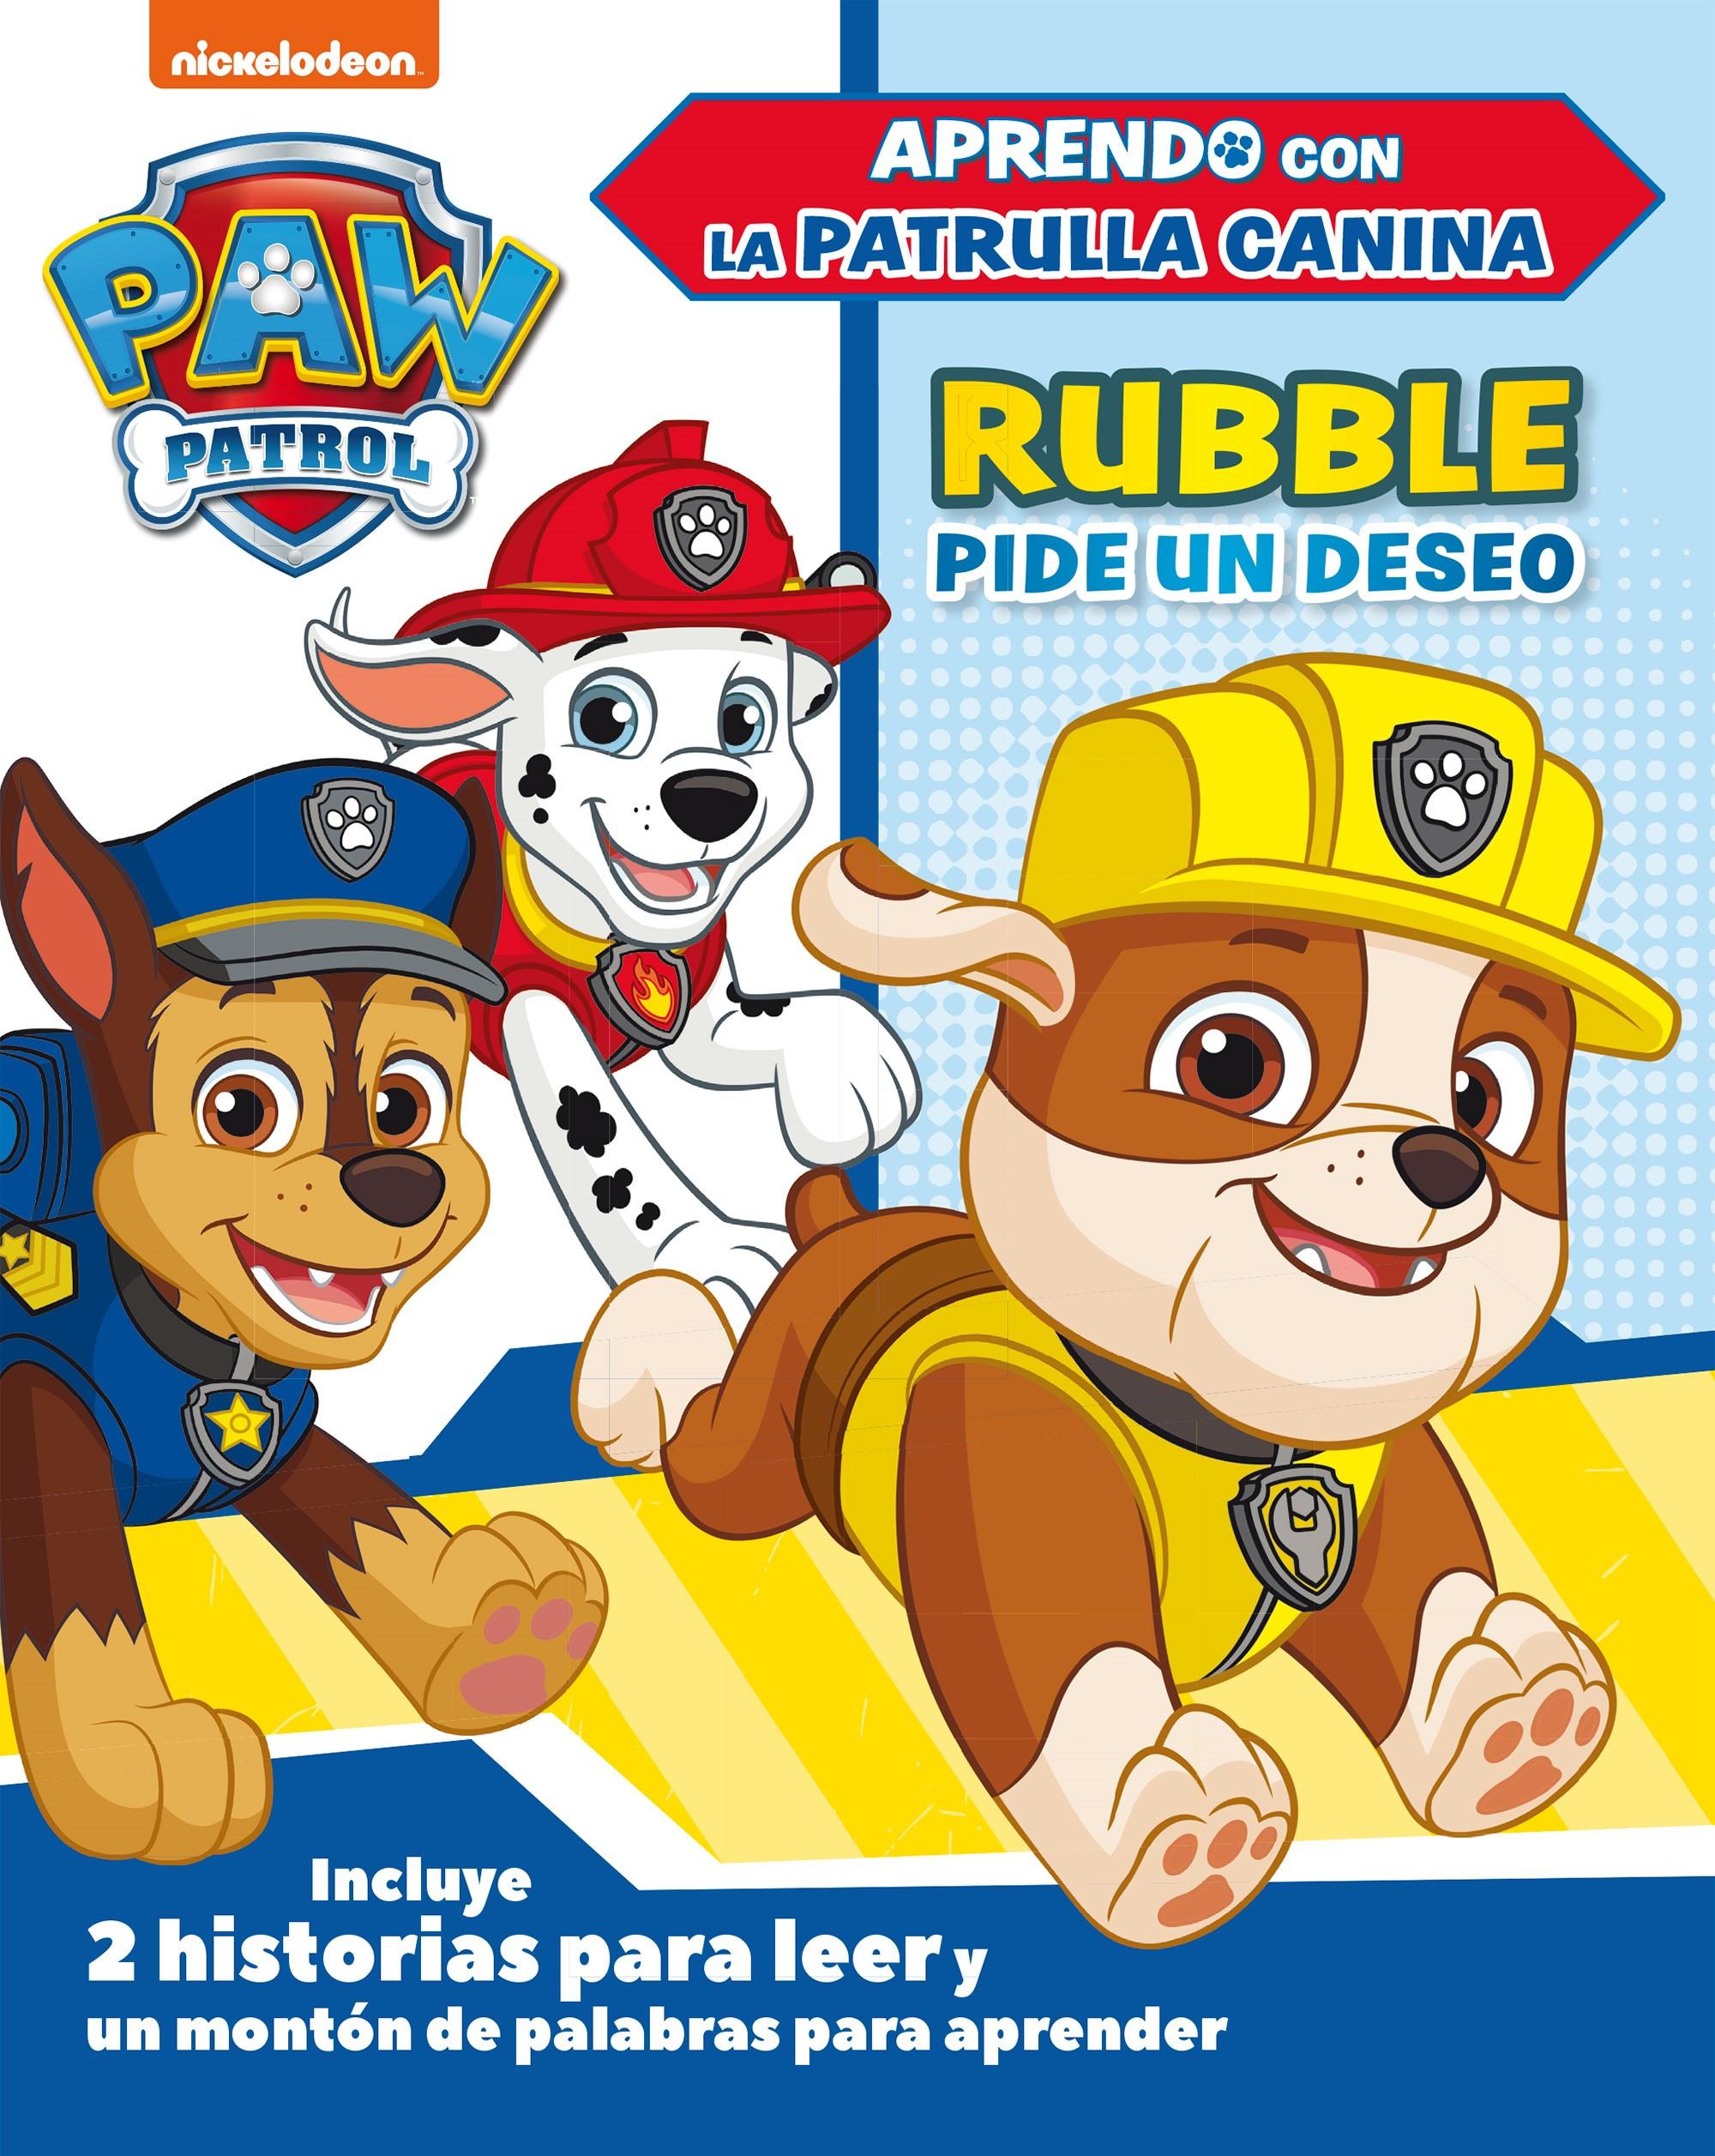 Rubble pide un deseo (Aprendo con la Patrulla Canina | Paw Patrol)